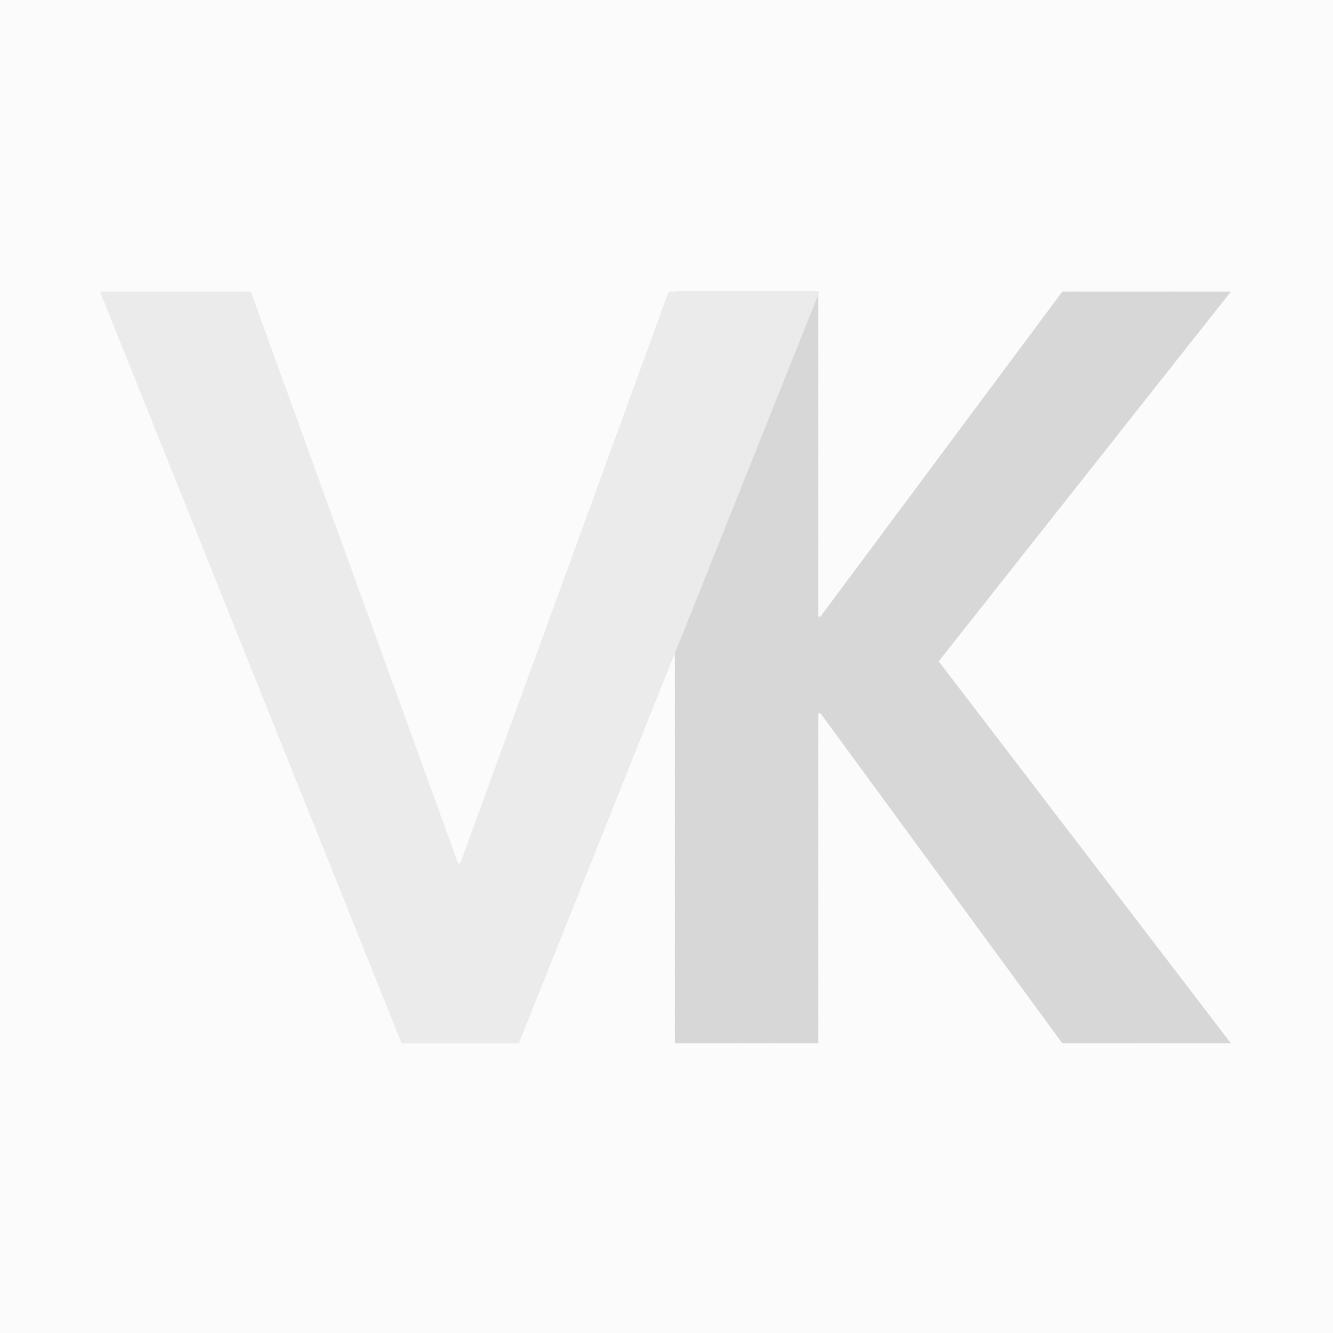 Krultang Ultron Revolv'it 26mm